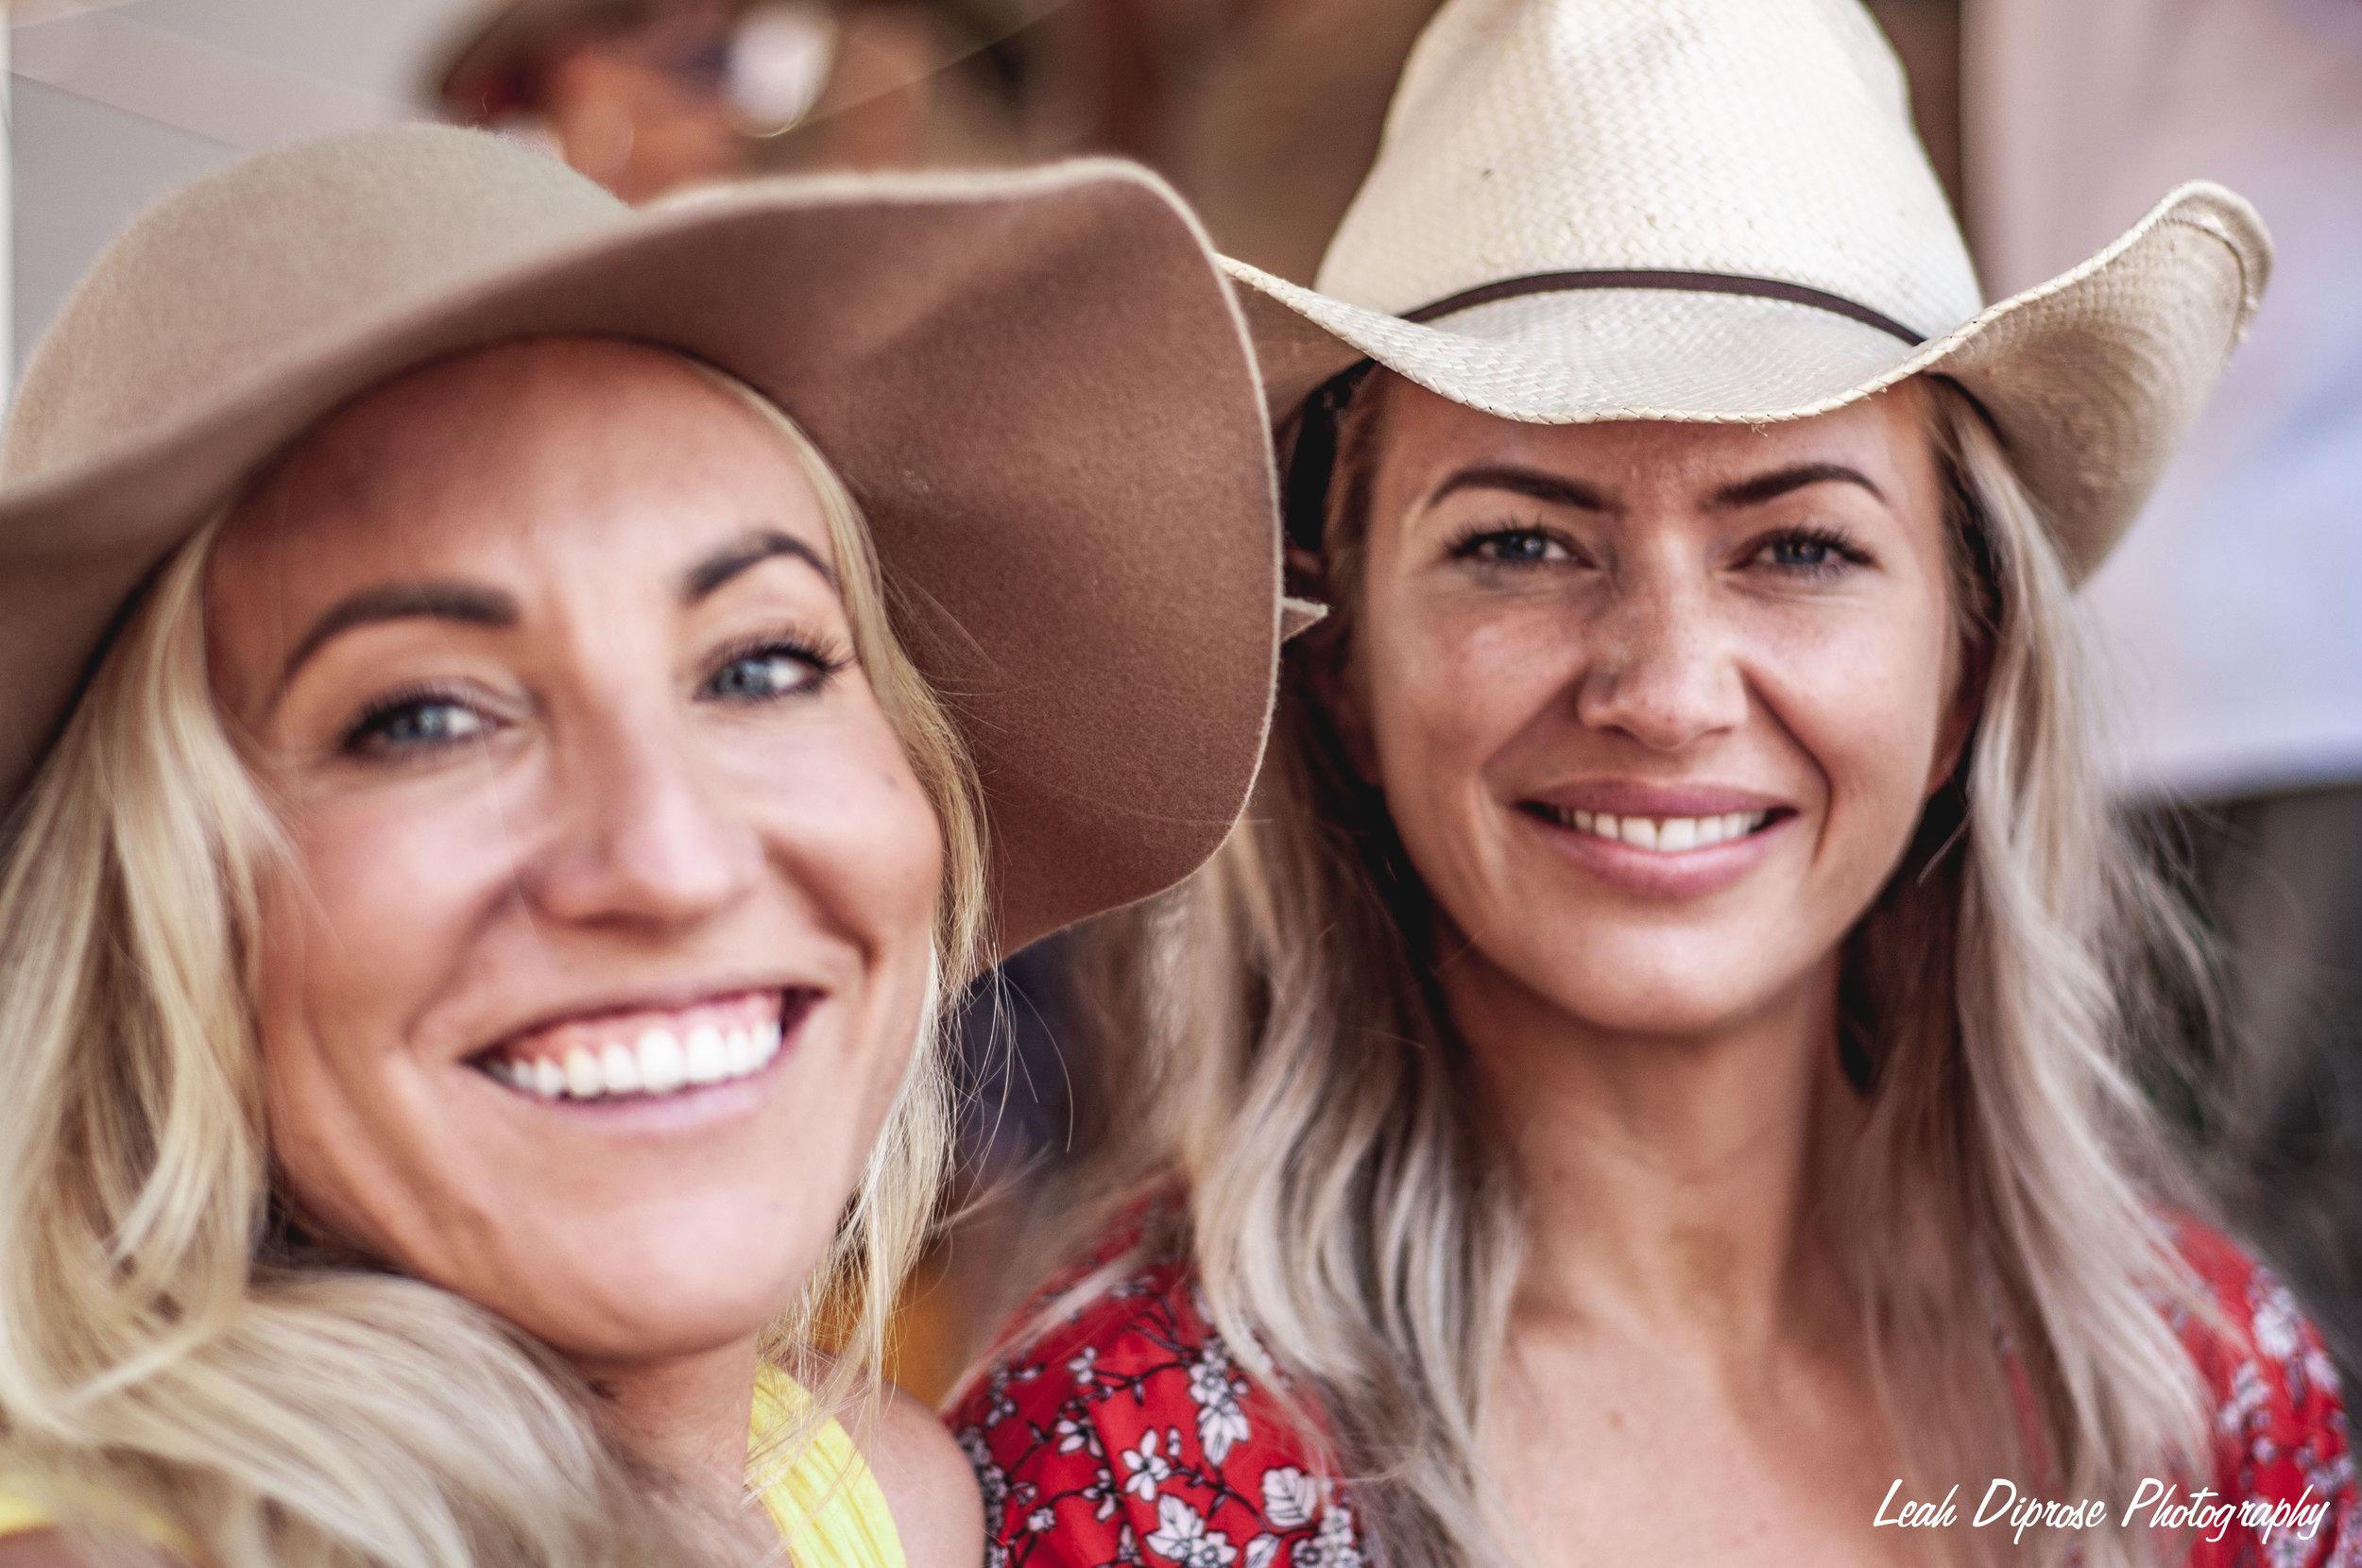 Leah Diprose Photography image-6286.jpg